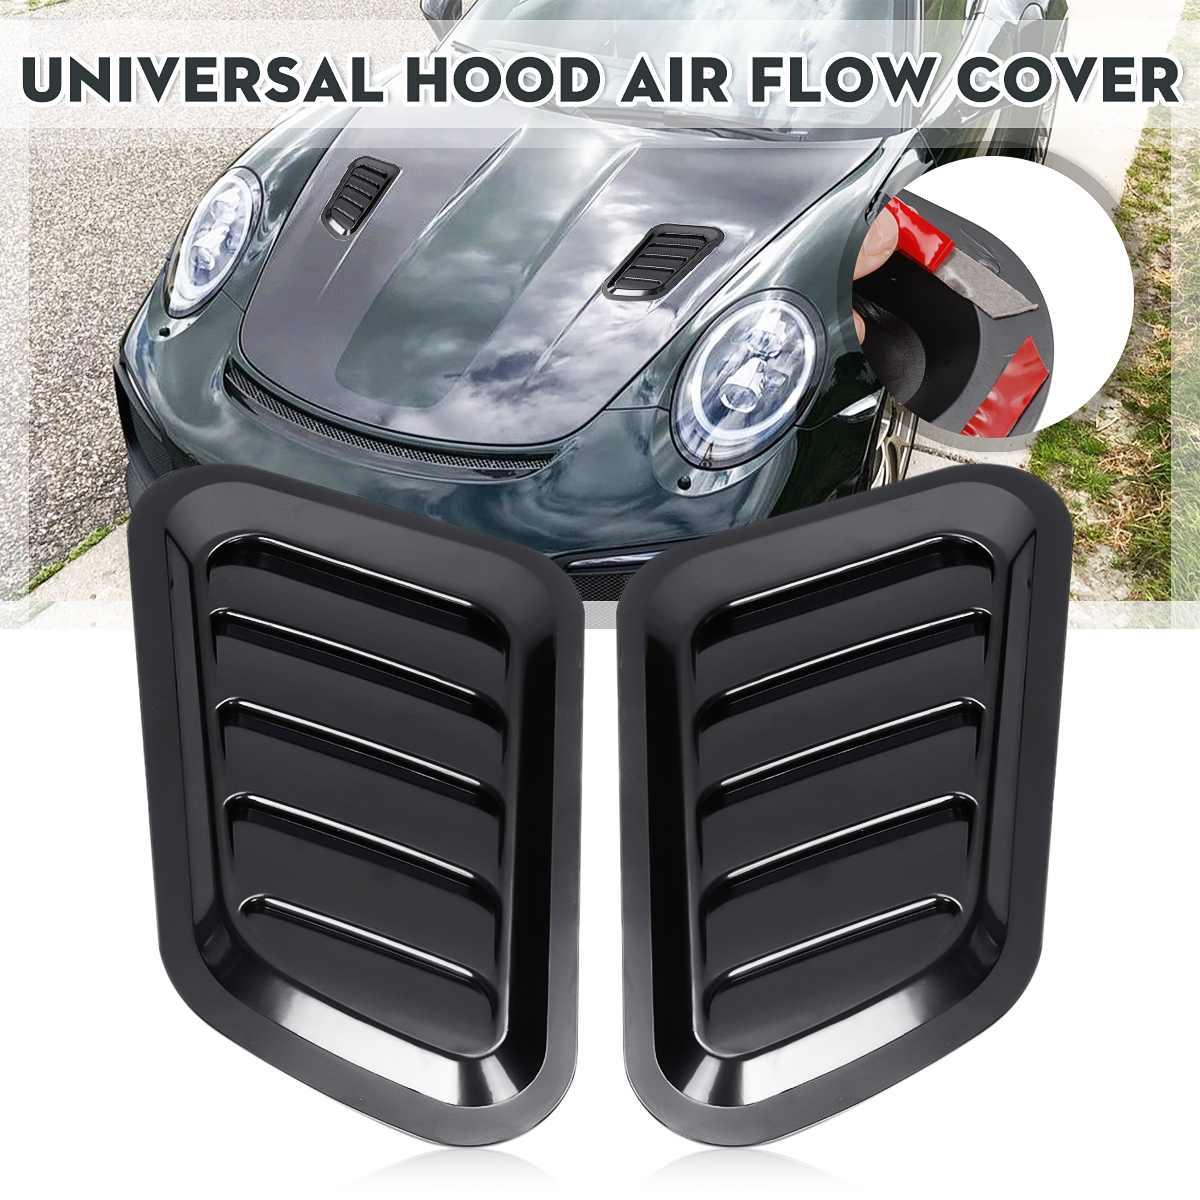 2Pcs ABS Car Front Engine Cover Sticker Car Decorative Air Outlet Flow Fender Intake Scoop Turbo Bonnet Vent Cover Hood